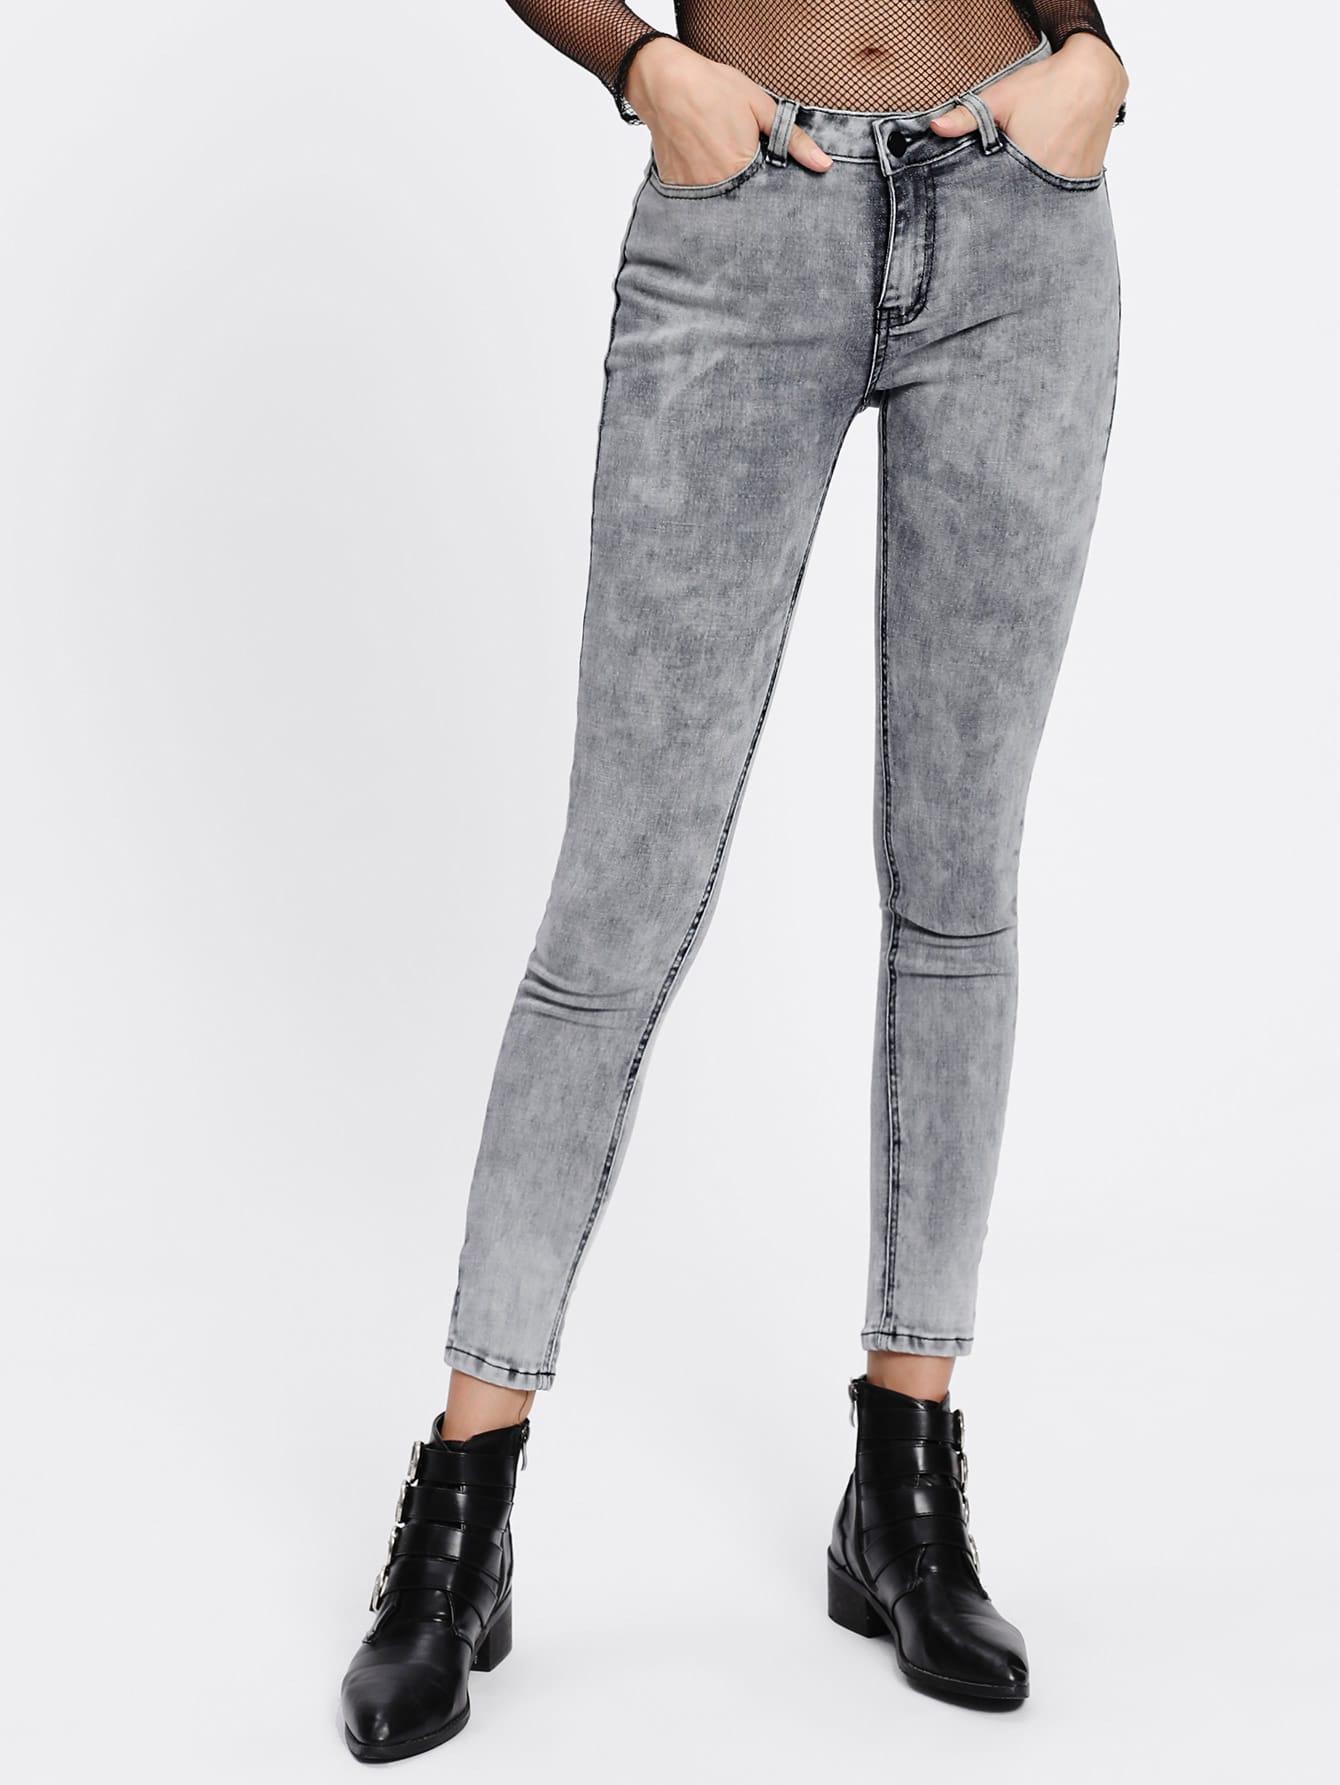 Acid Wash Skinny Jeans джеймс эшер bhakta ranga rasa india новый взгляд mp3